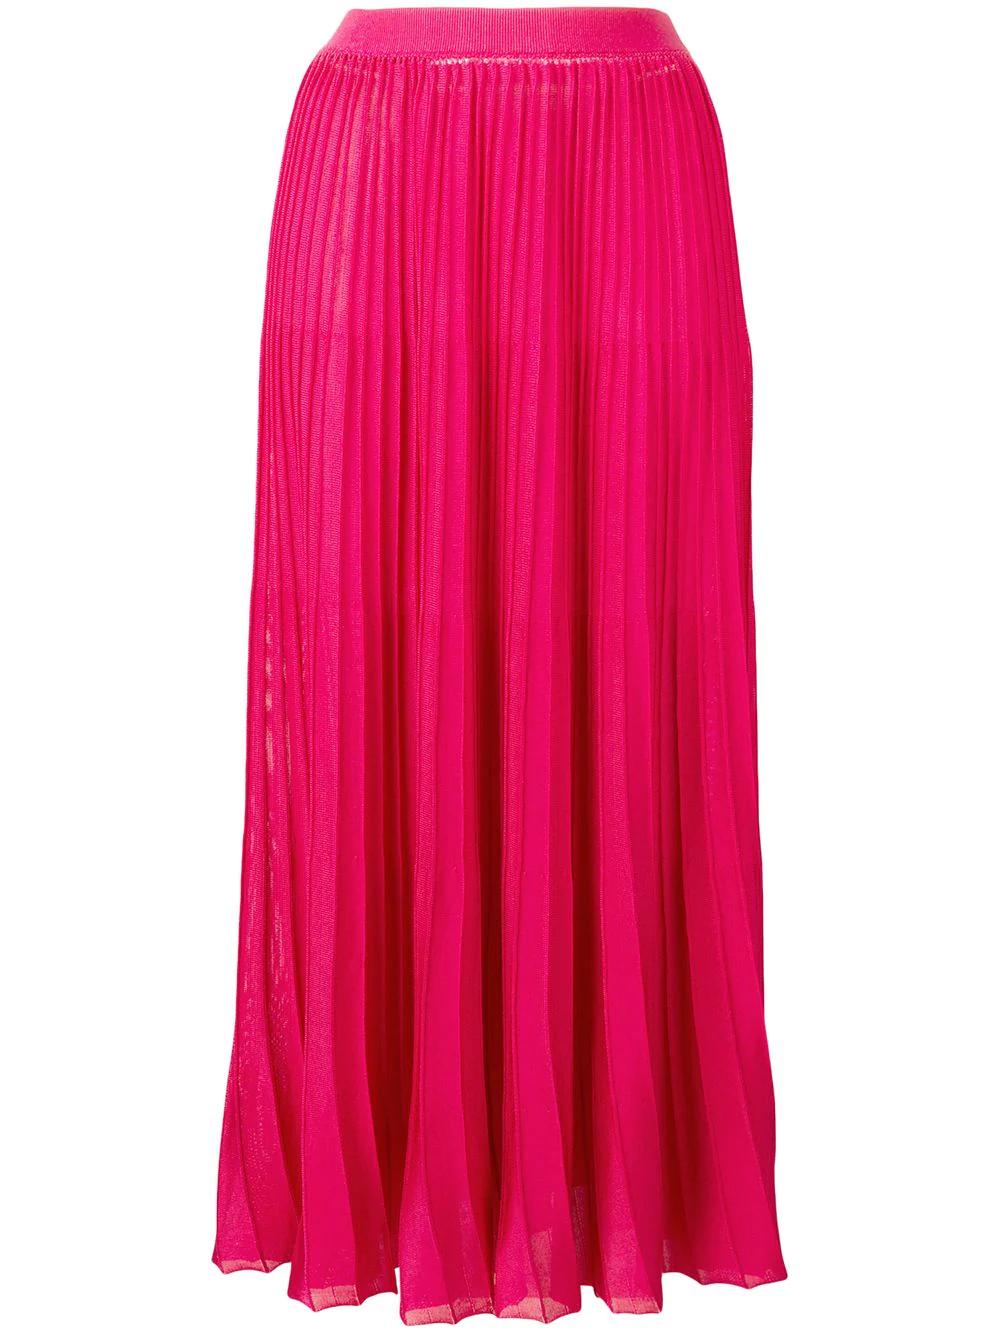 Sonia Rykiel | плиссированная юбка миди | Clouty